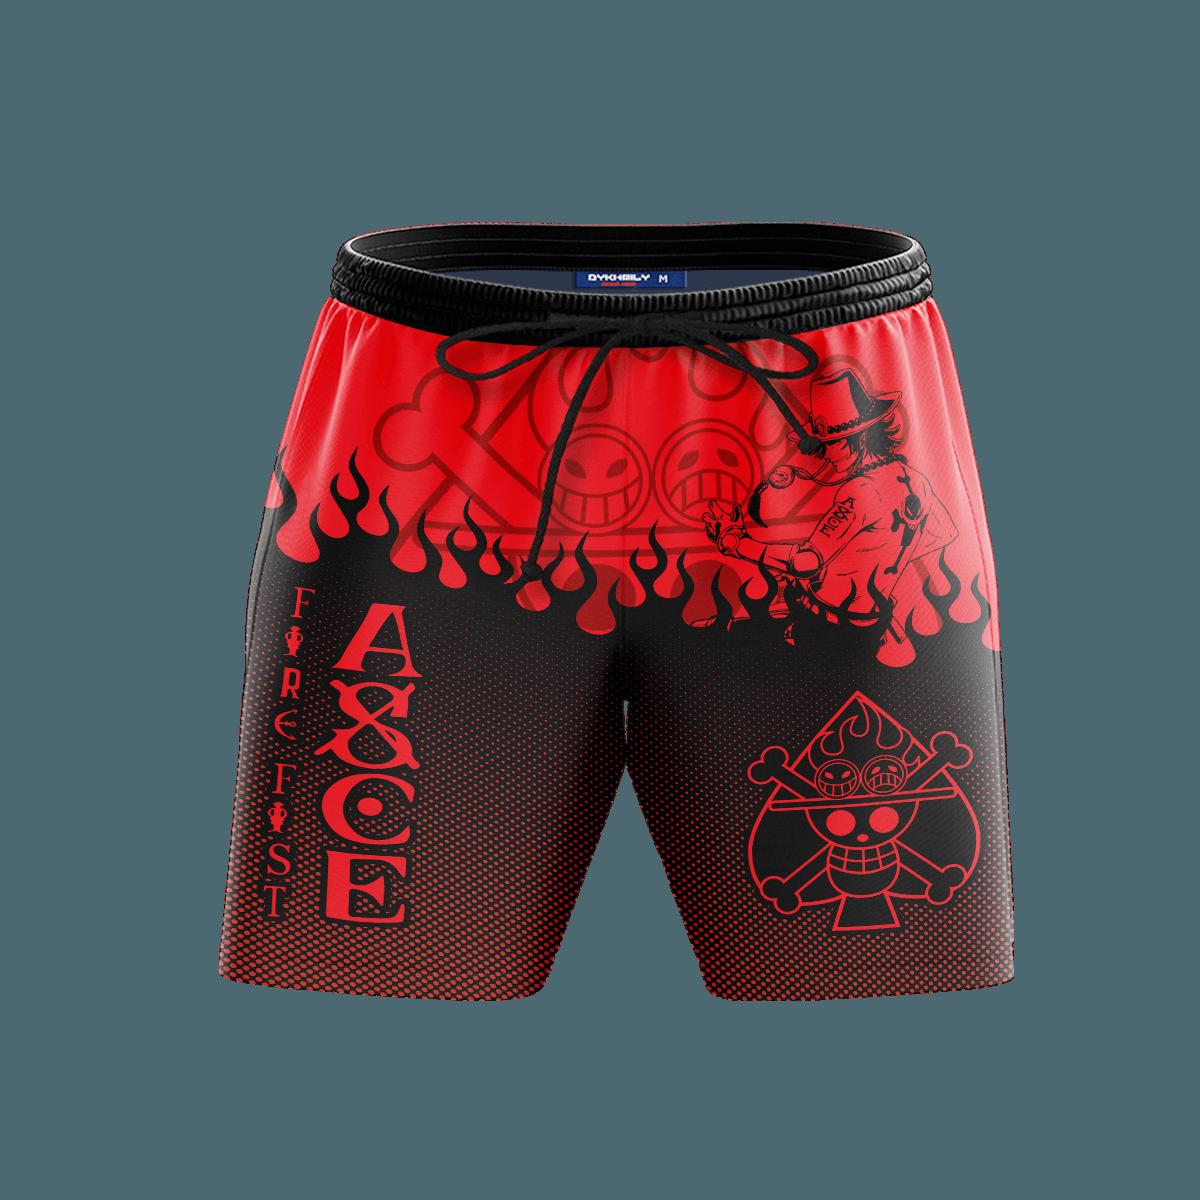 Blazing Ace Beach Shorts FDM3107 S Official Anime Swimsuit Merch